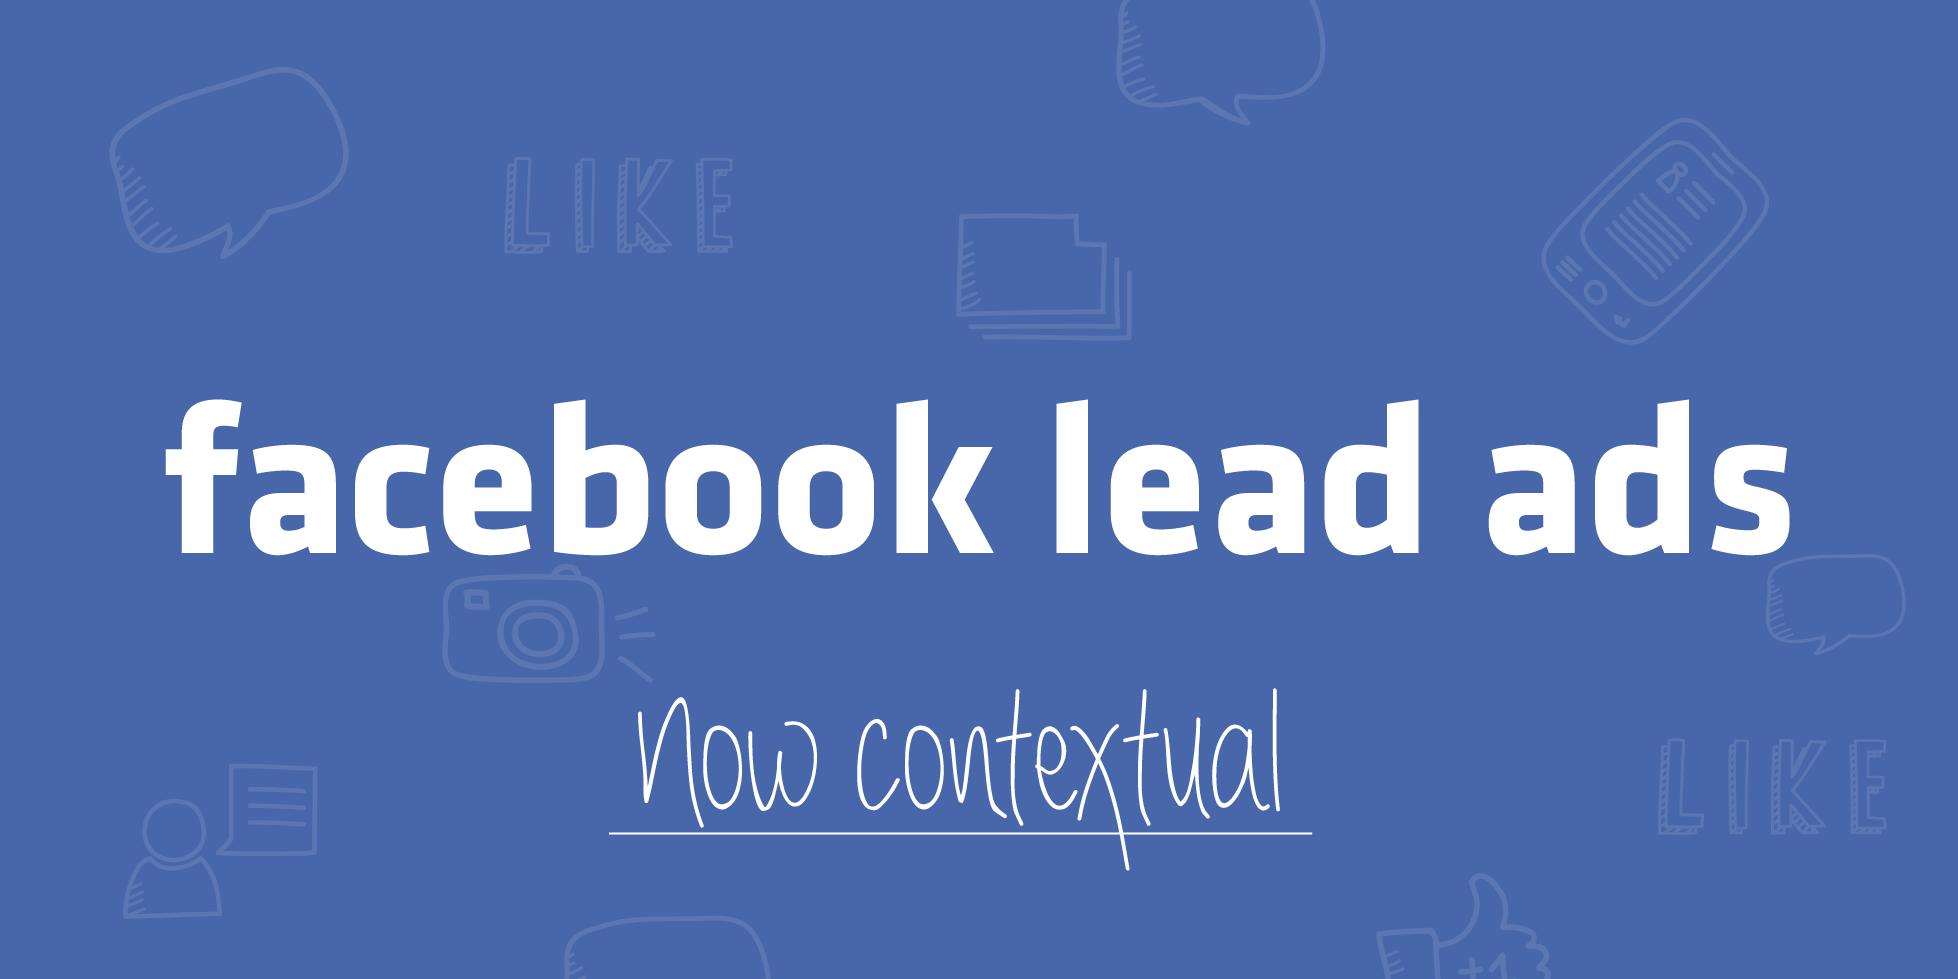 Facebook lead ads context card